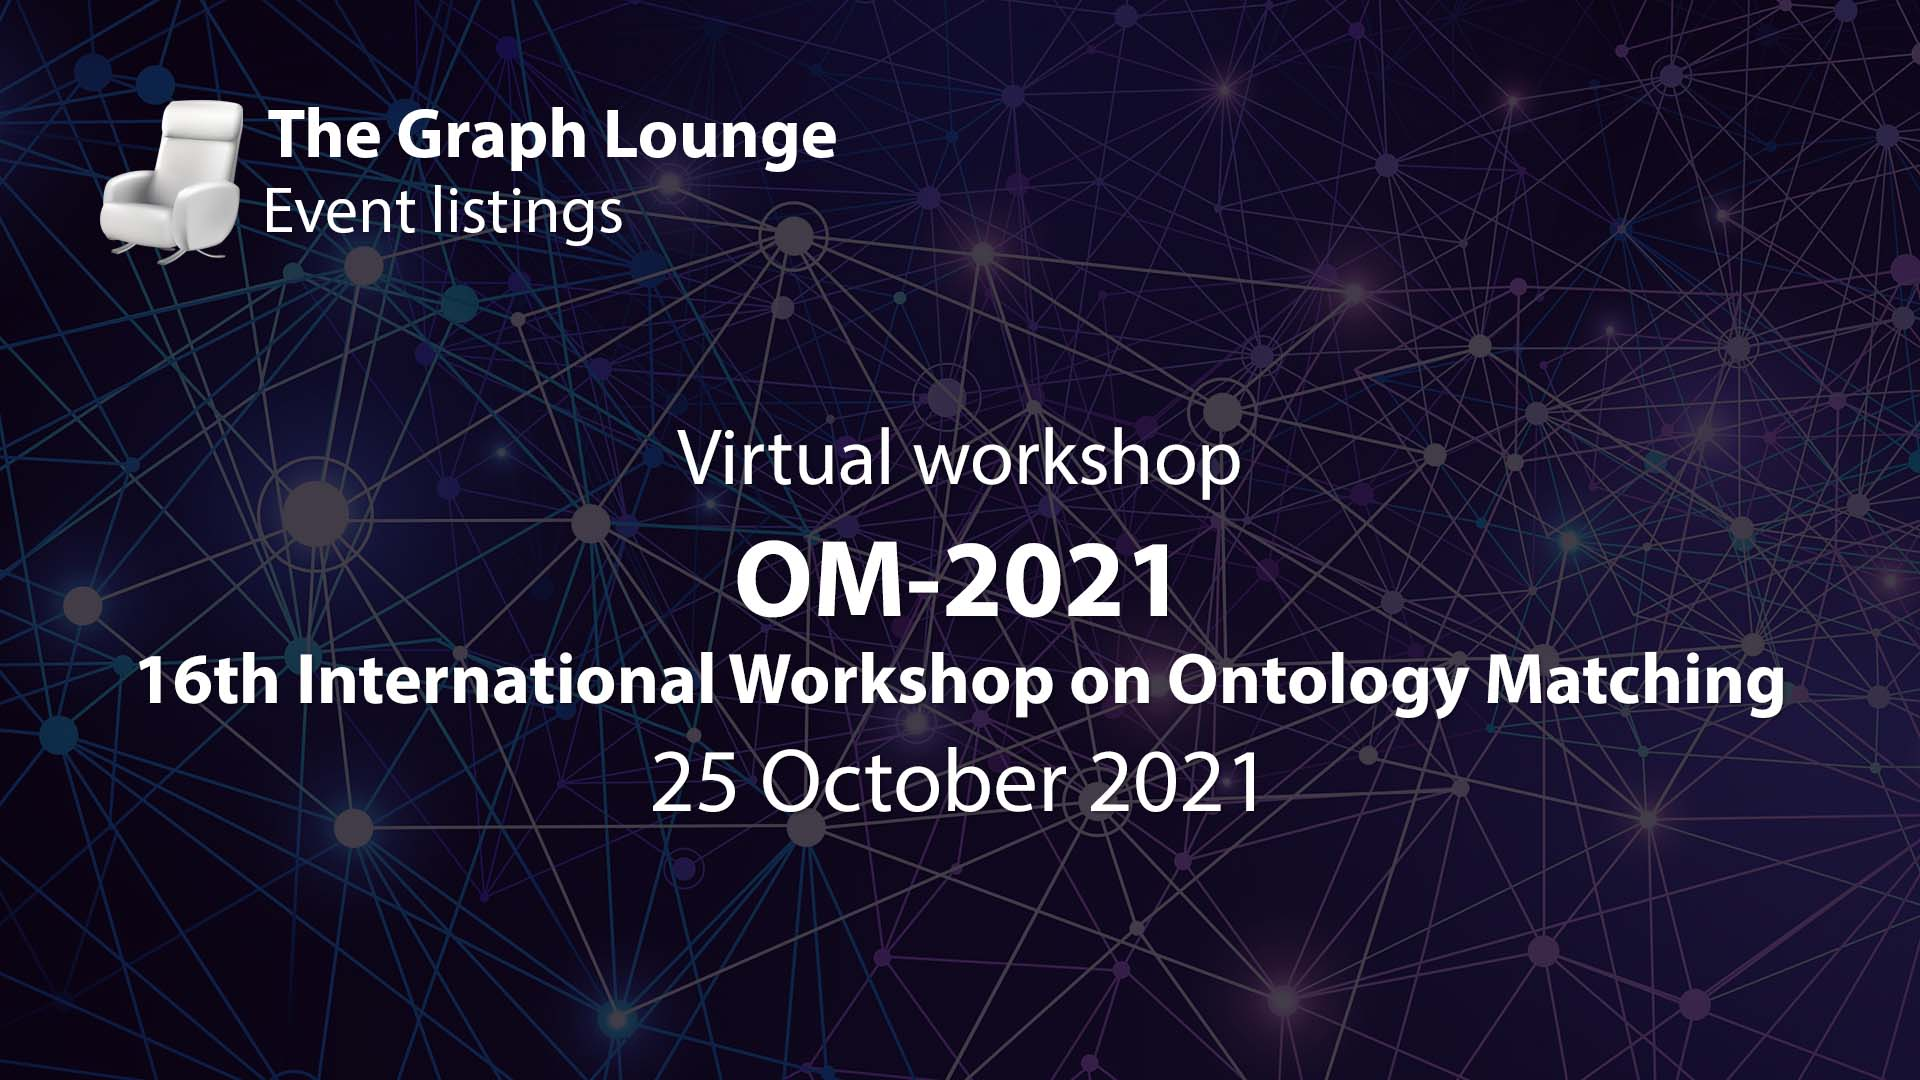 OM-2021 (16th International Workshop on Ontology Matching)